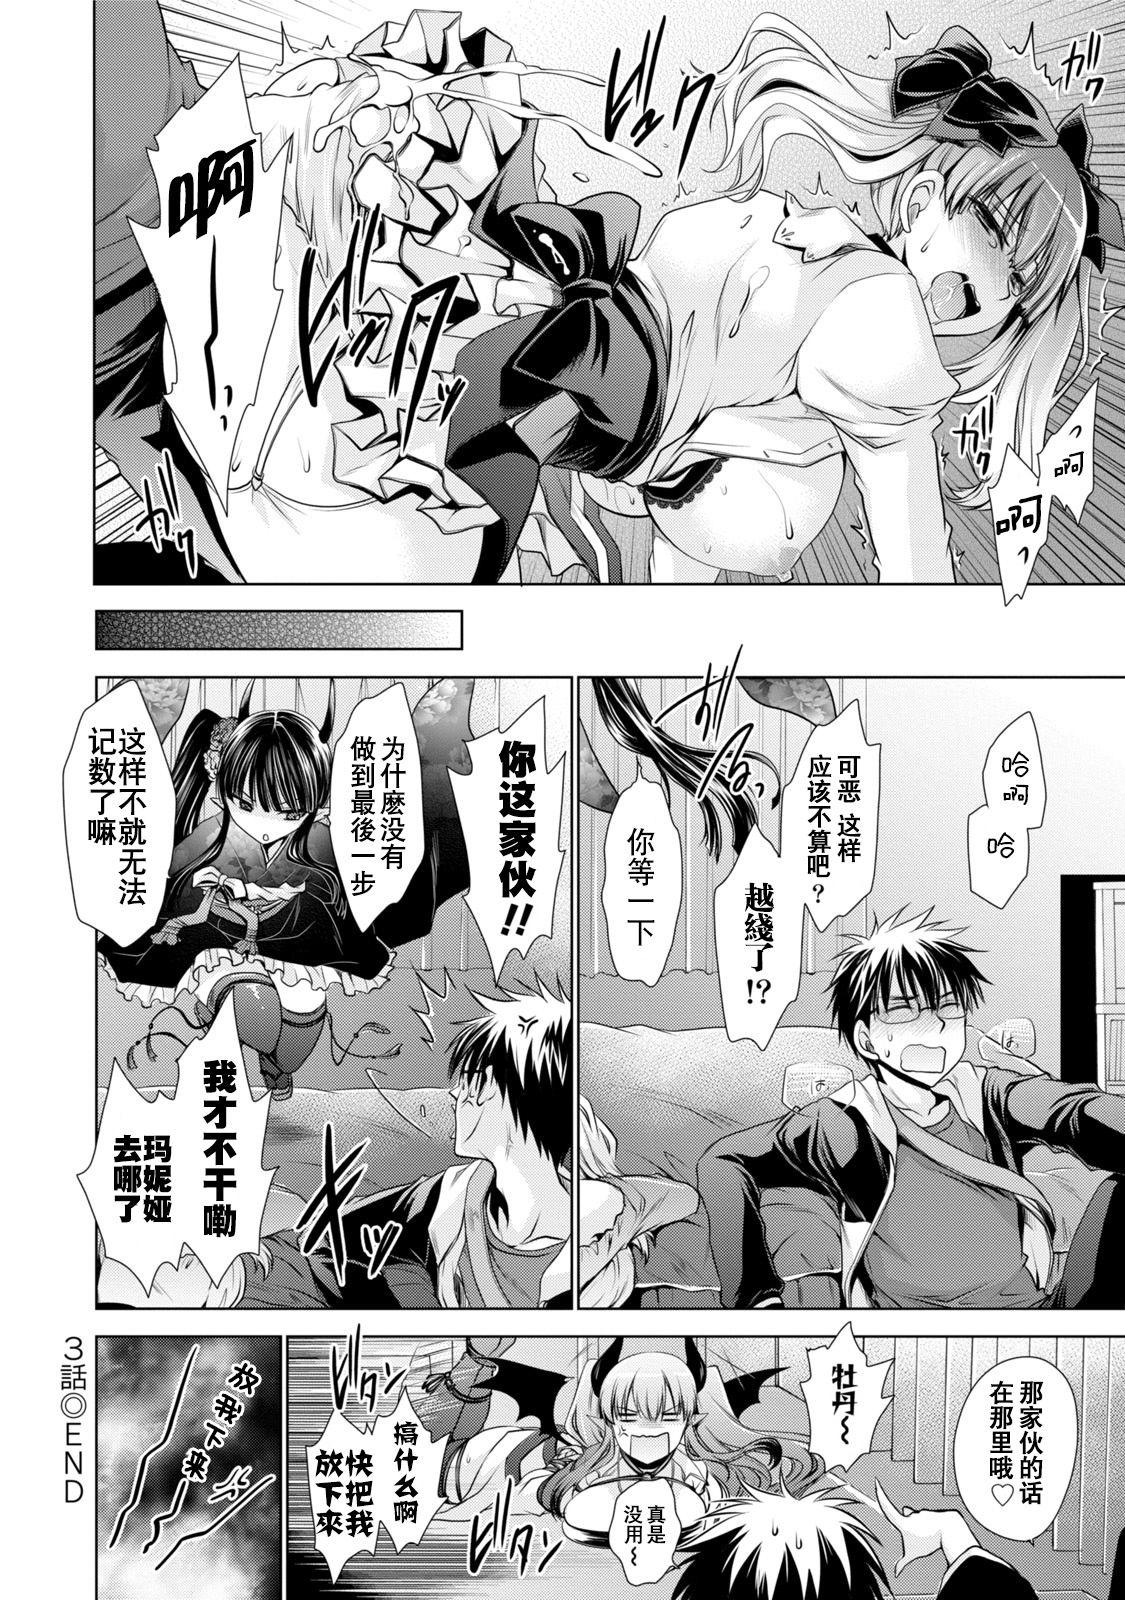 [Shinonome Ryu] Ore to Kanojo to Owaru Sekai - World's end LoveStory ch.1-9 [Chinese] [爱弹幕汉化组] [Digital] 65